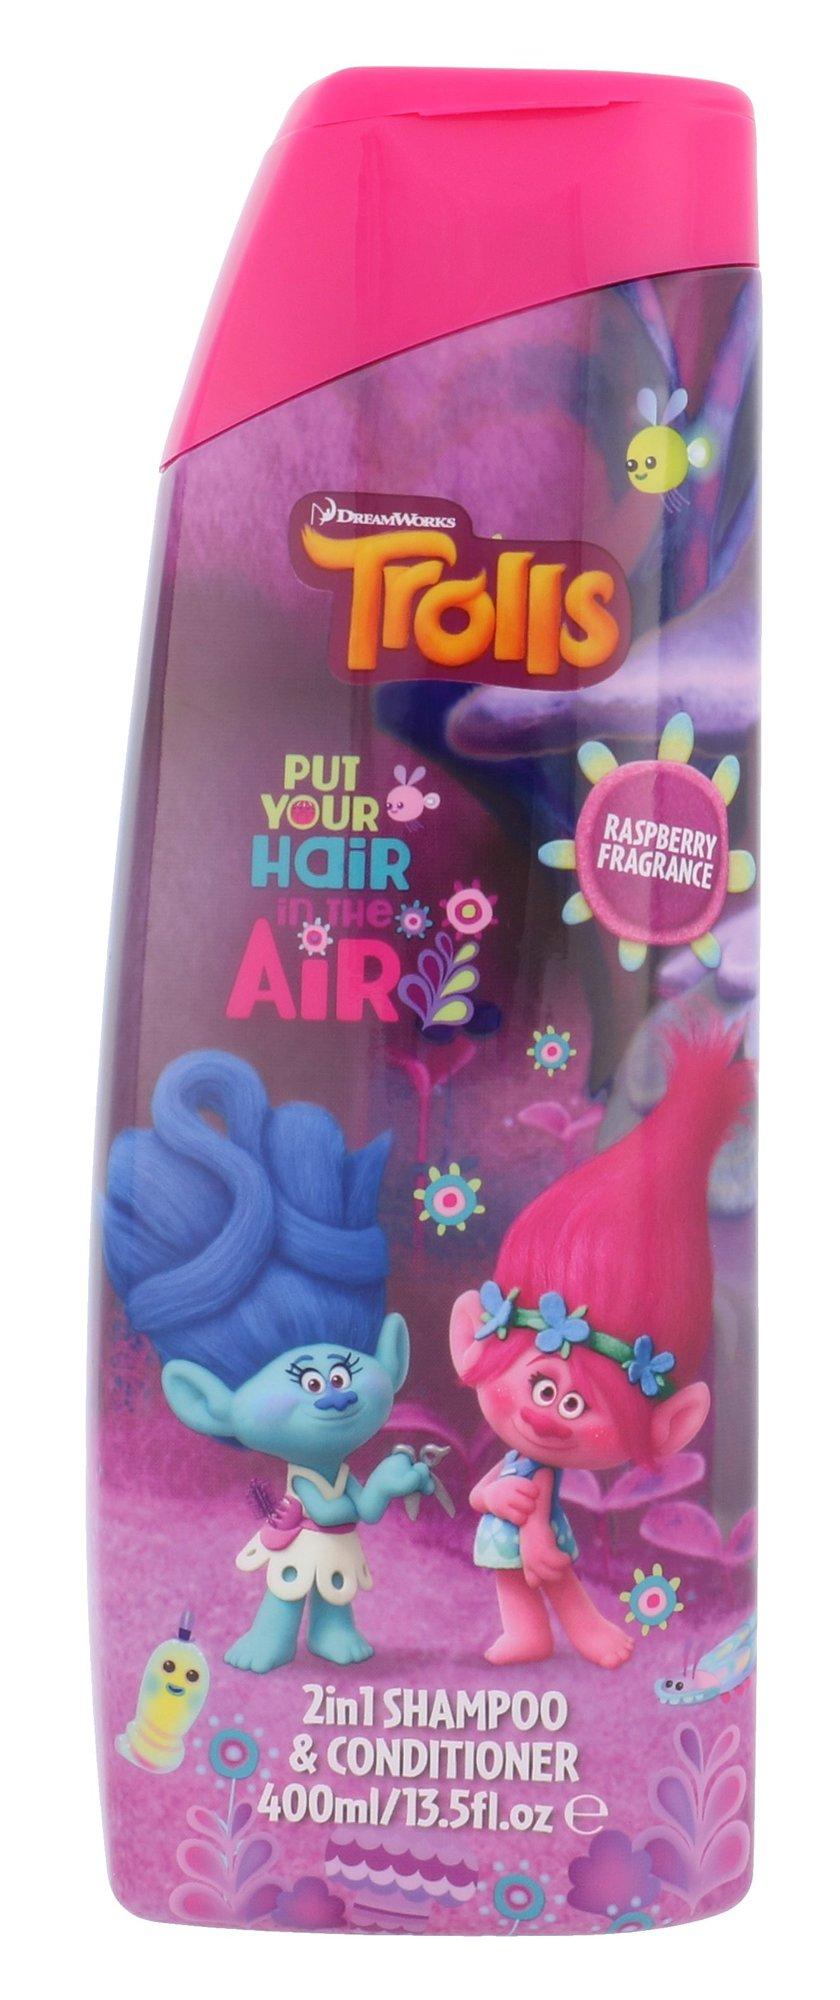 DreamWorks Trolls Cosmetic 400ml  2in1 Shampoo & Conditioner